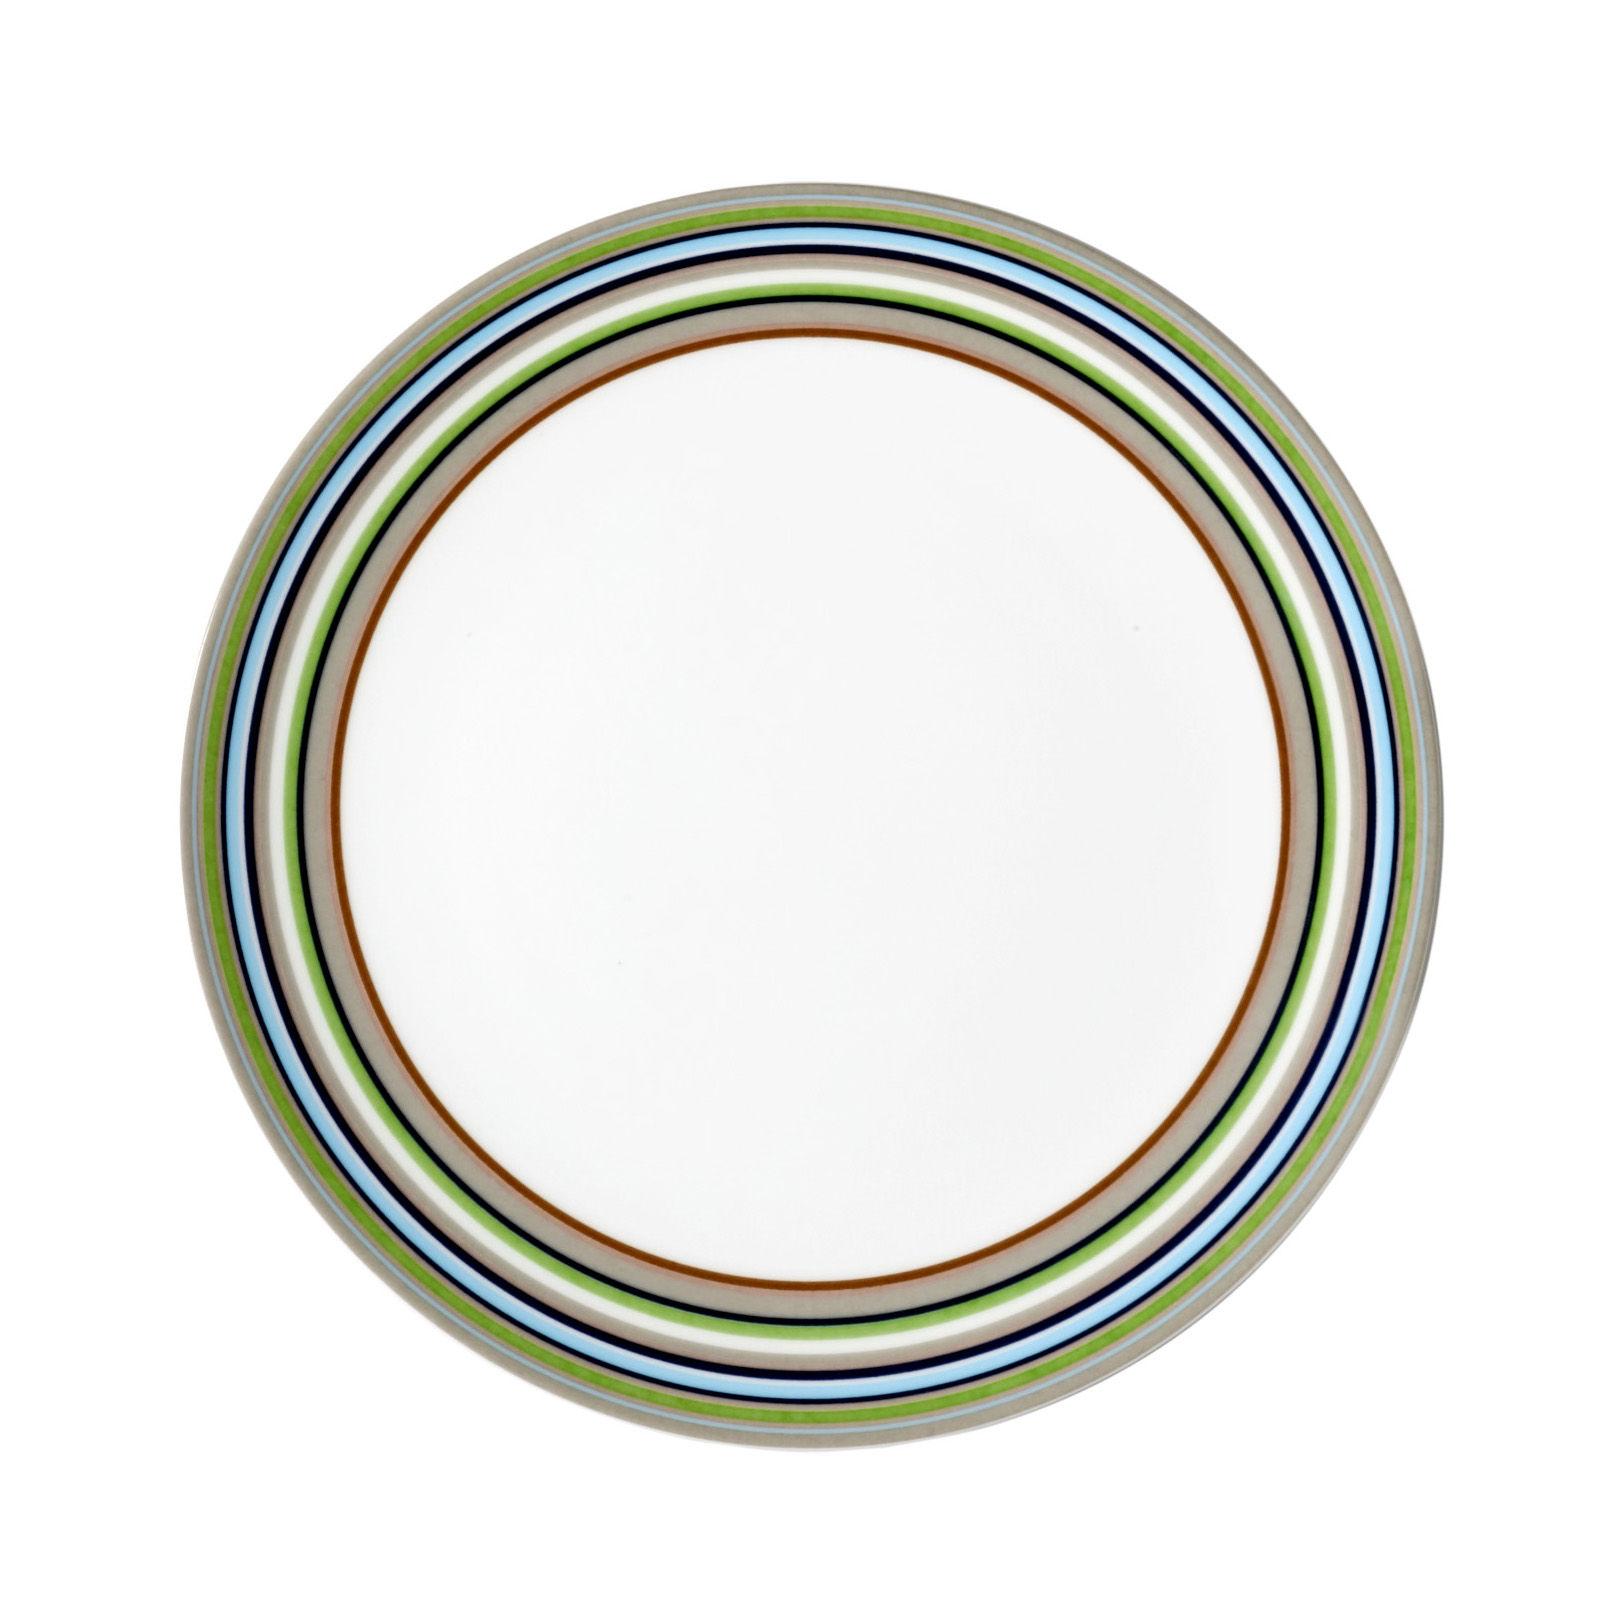 Tableware - Plates - Origo Dessert plate - Ø 20 cm by Iittala - Stripe Beige  Ø 20 cm - China